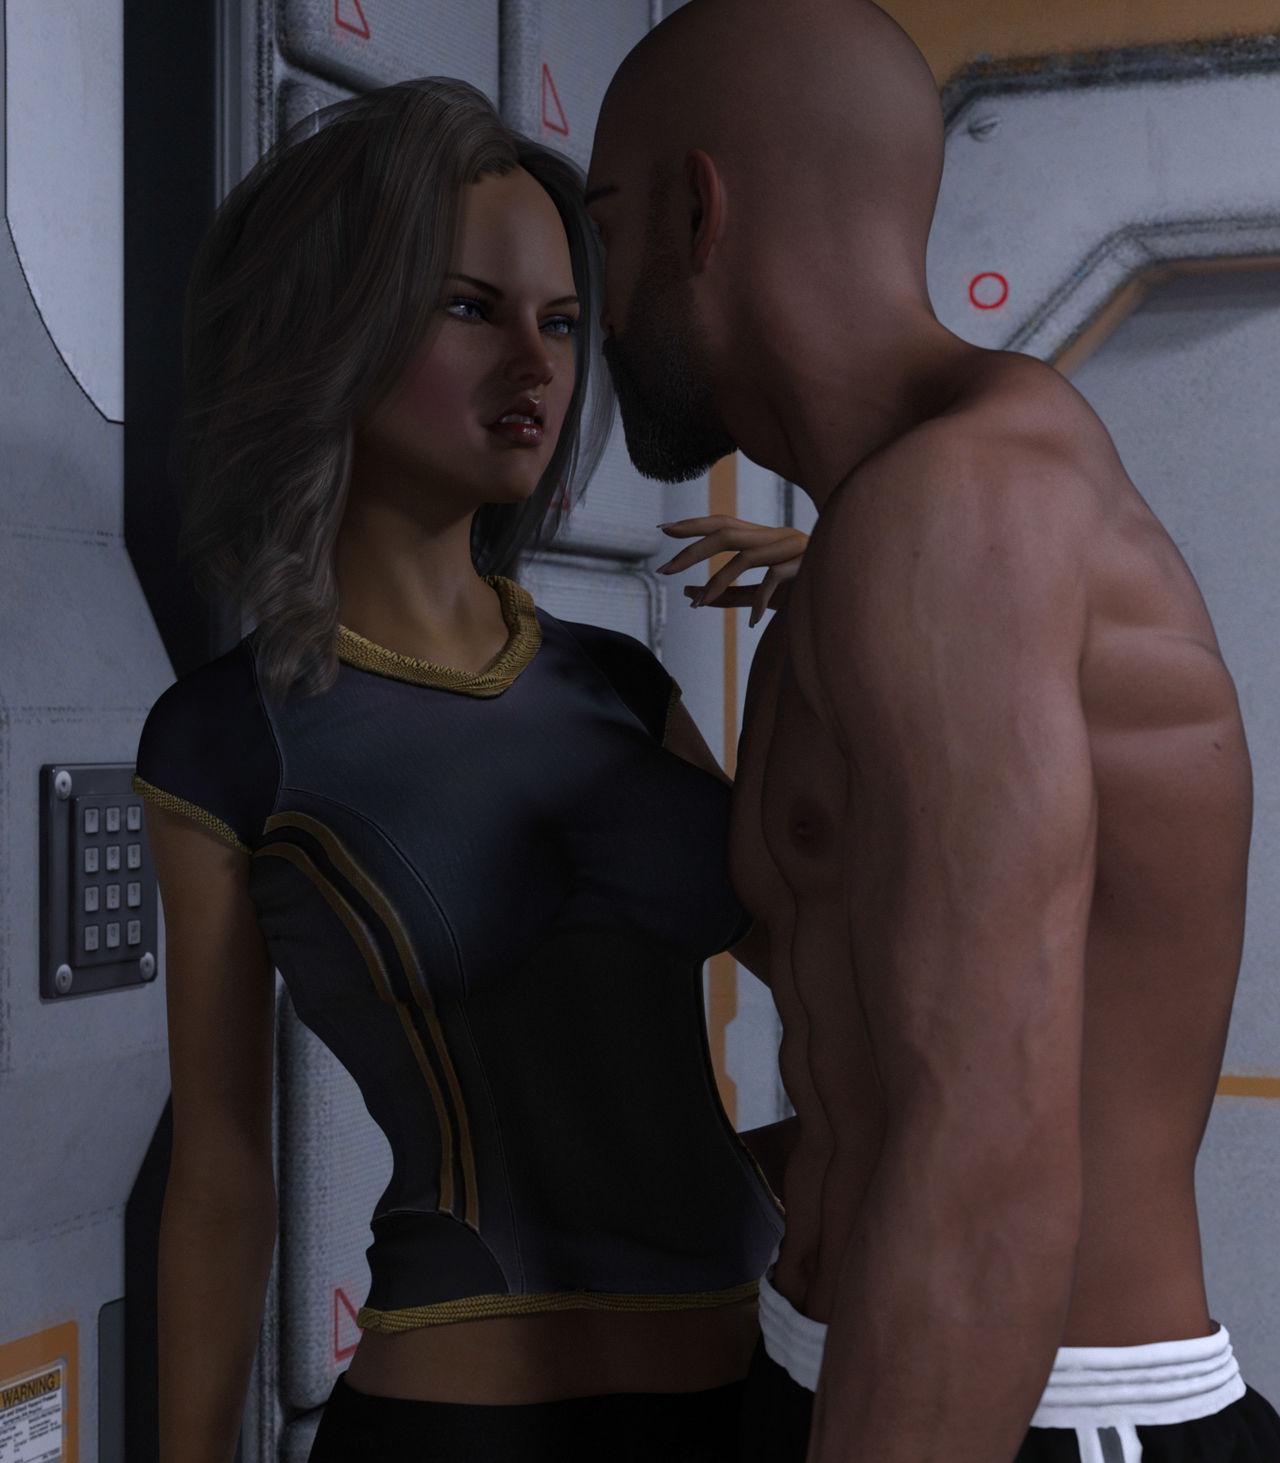 Hình ảnh 029 in Captain Anger